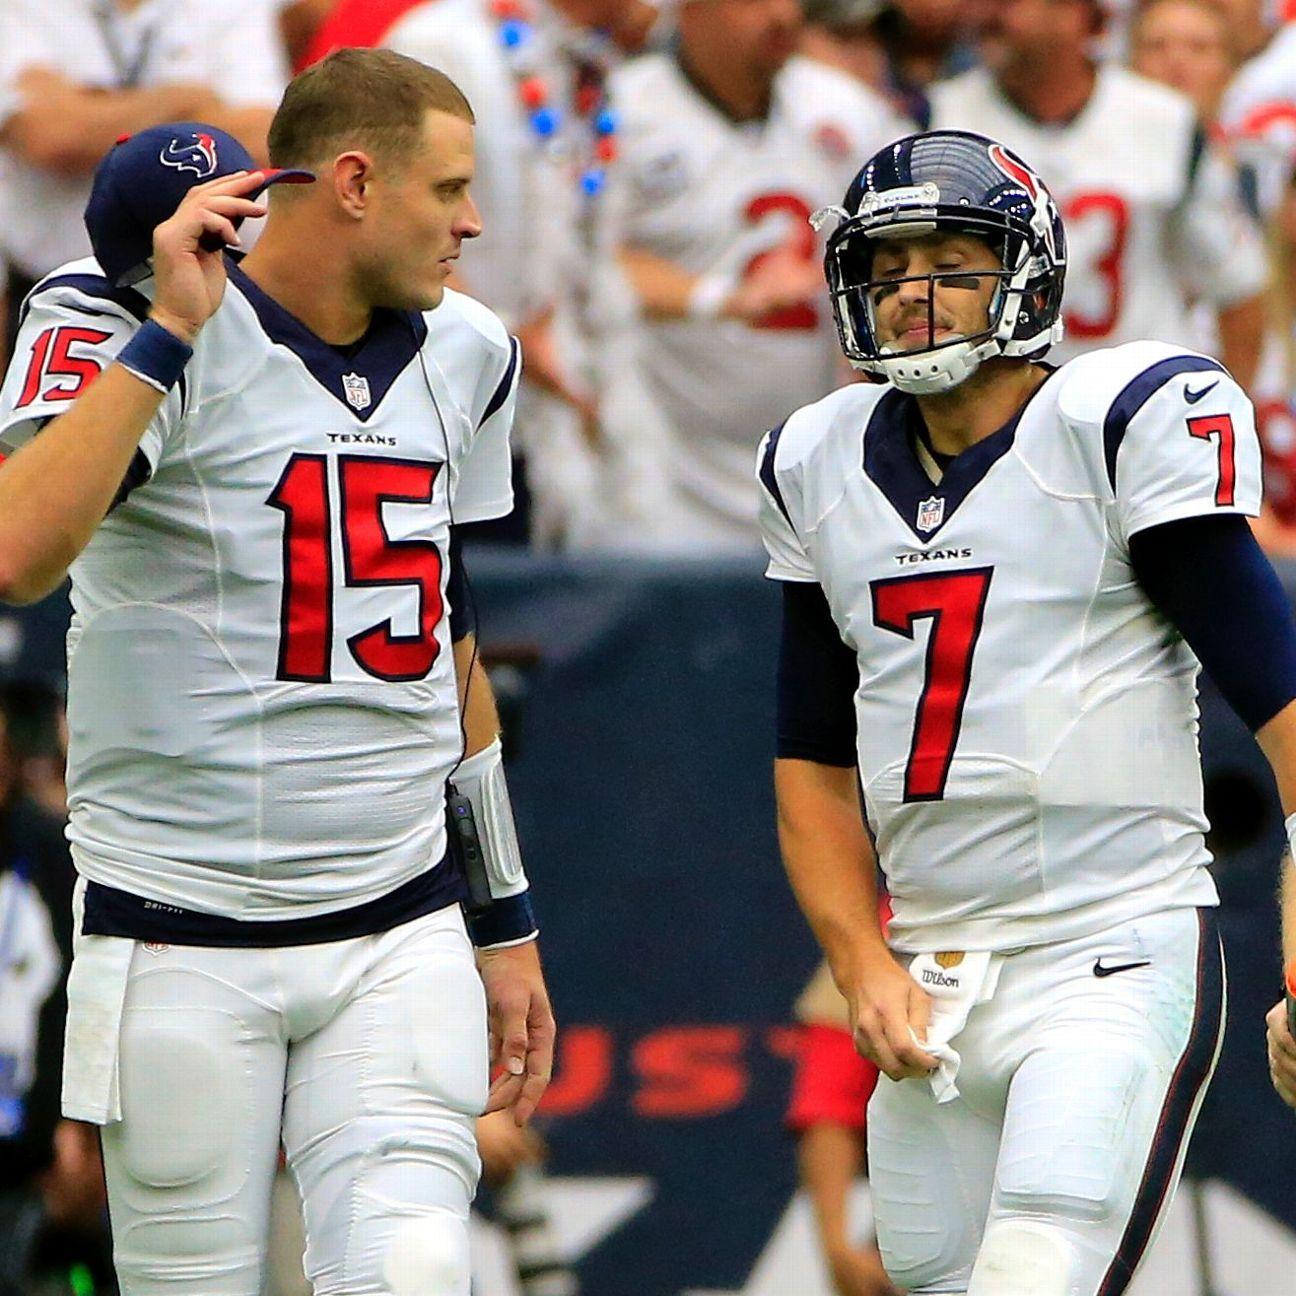 Sources Texans To Start Qb Mallett Vs Panthers Carolina Panthers Texans Quarterback Texans